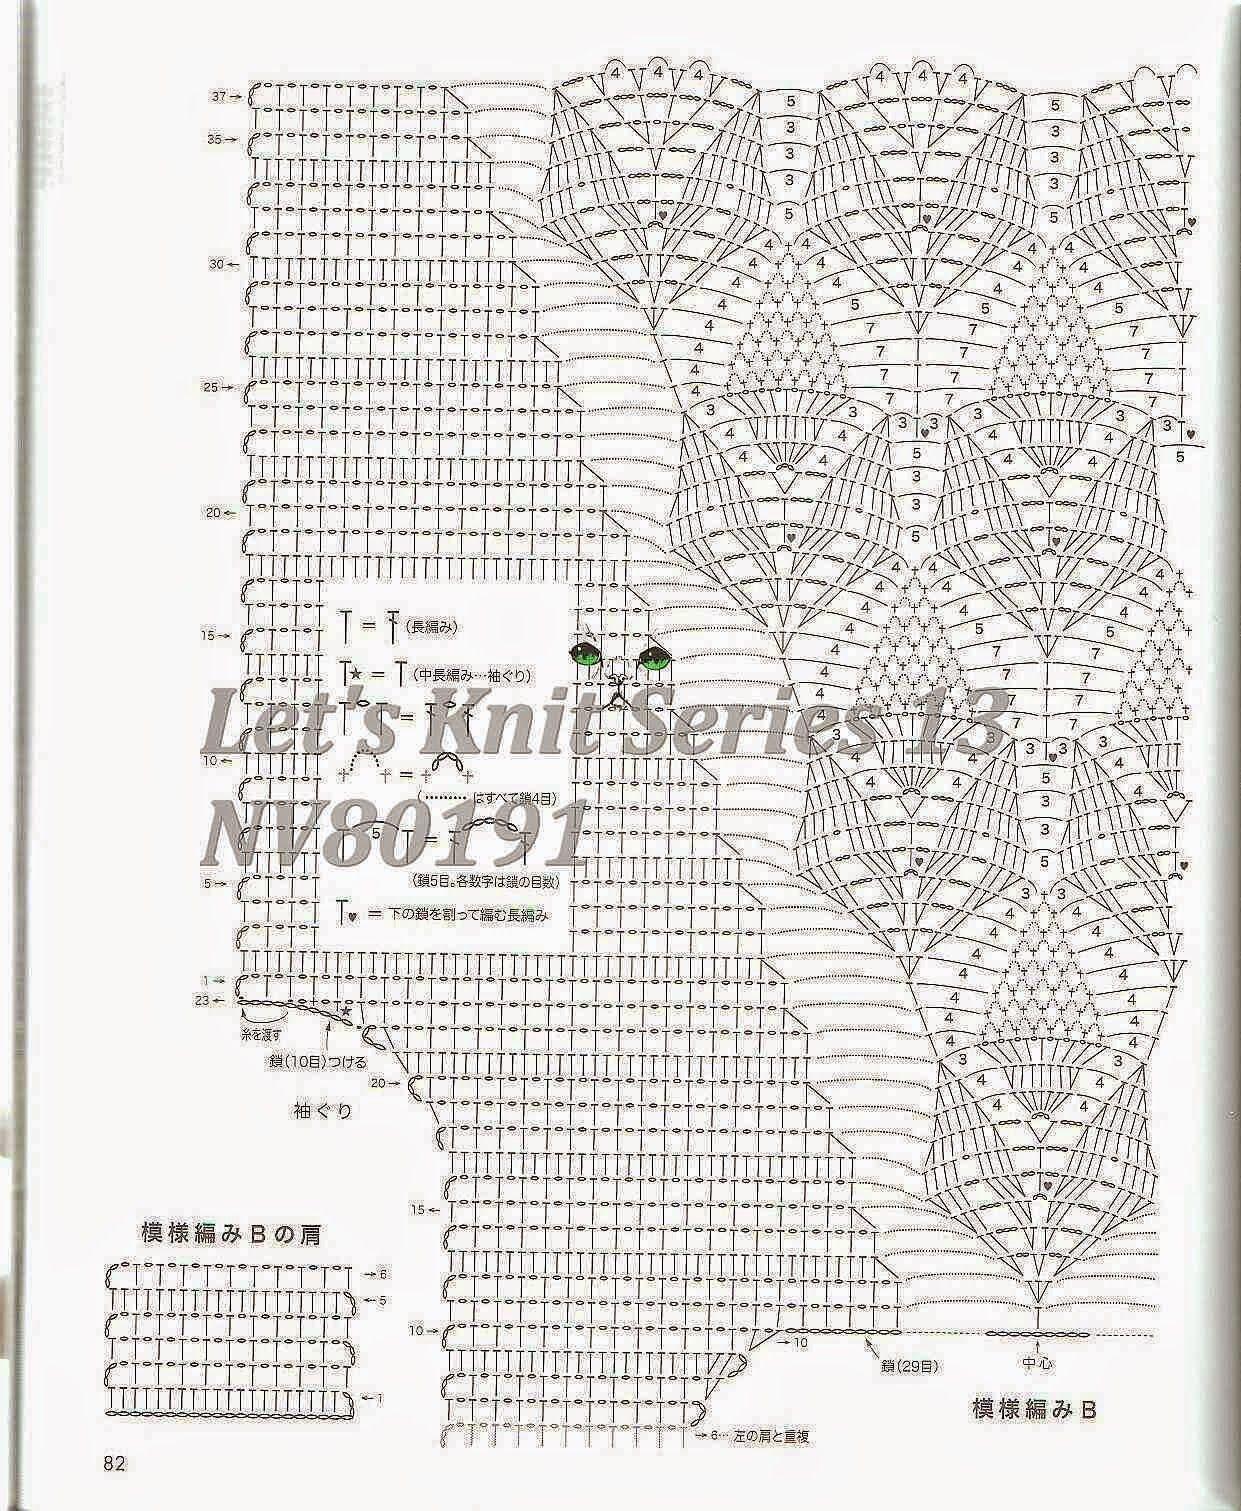 Pin de aure hernandez en chalecos | Pinterest | Patrones de crochet ...